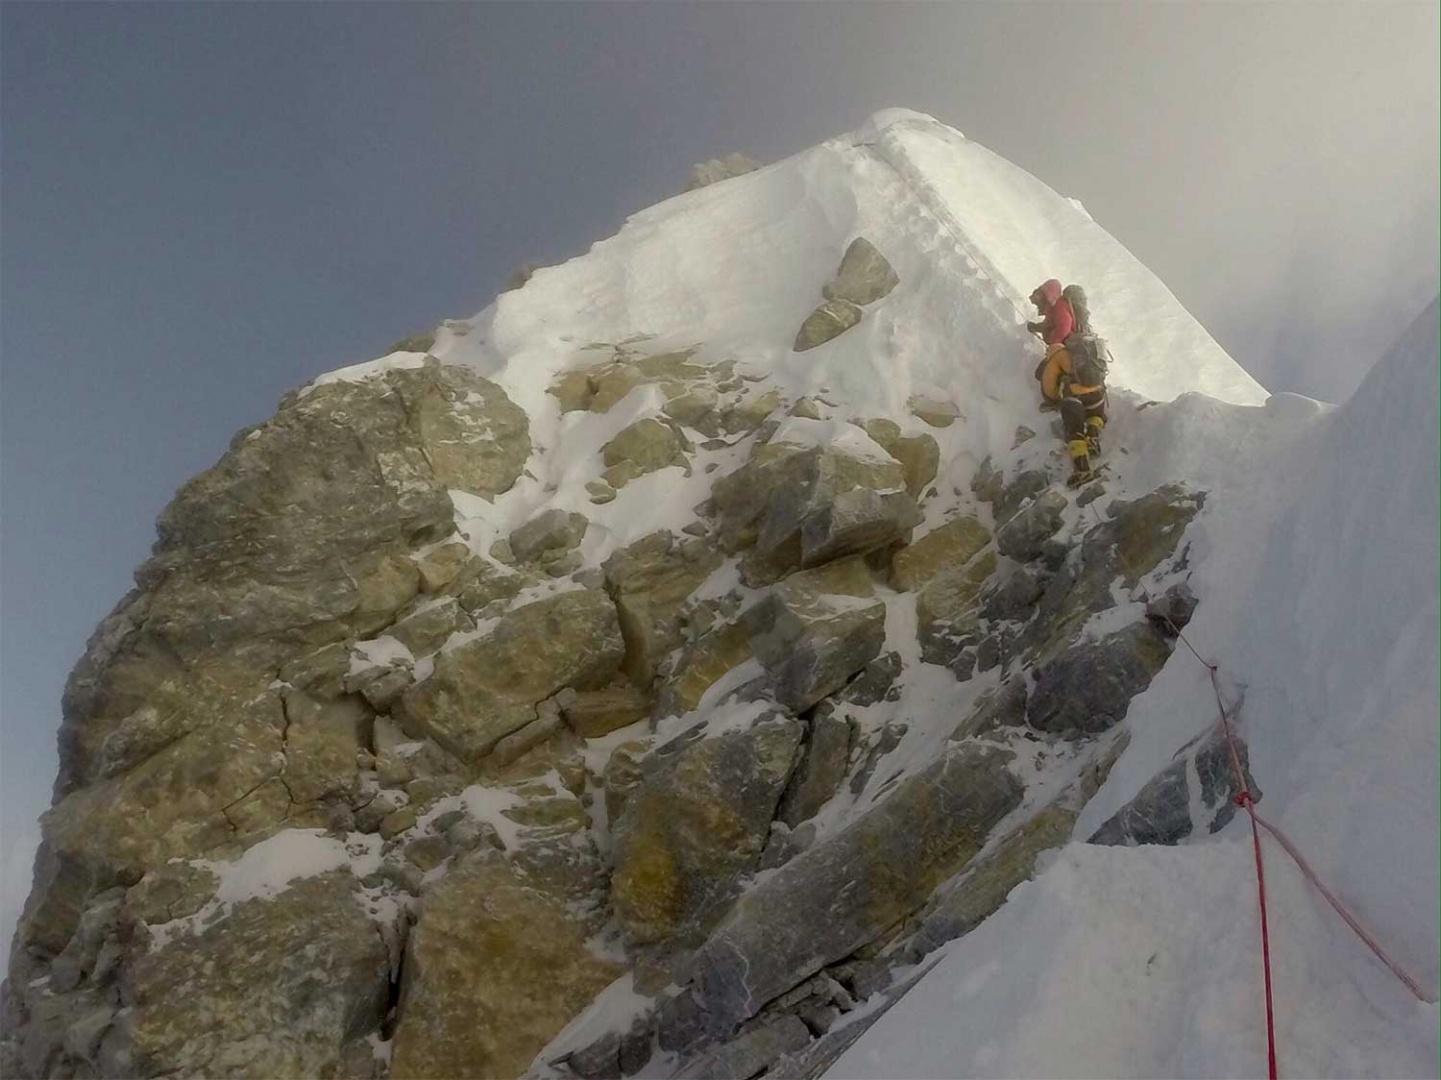 Escalón de Hillary en el Everest